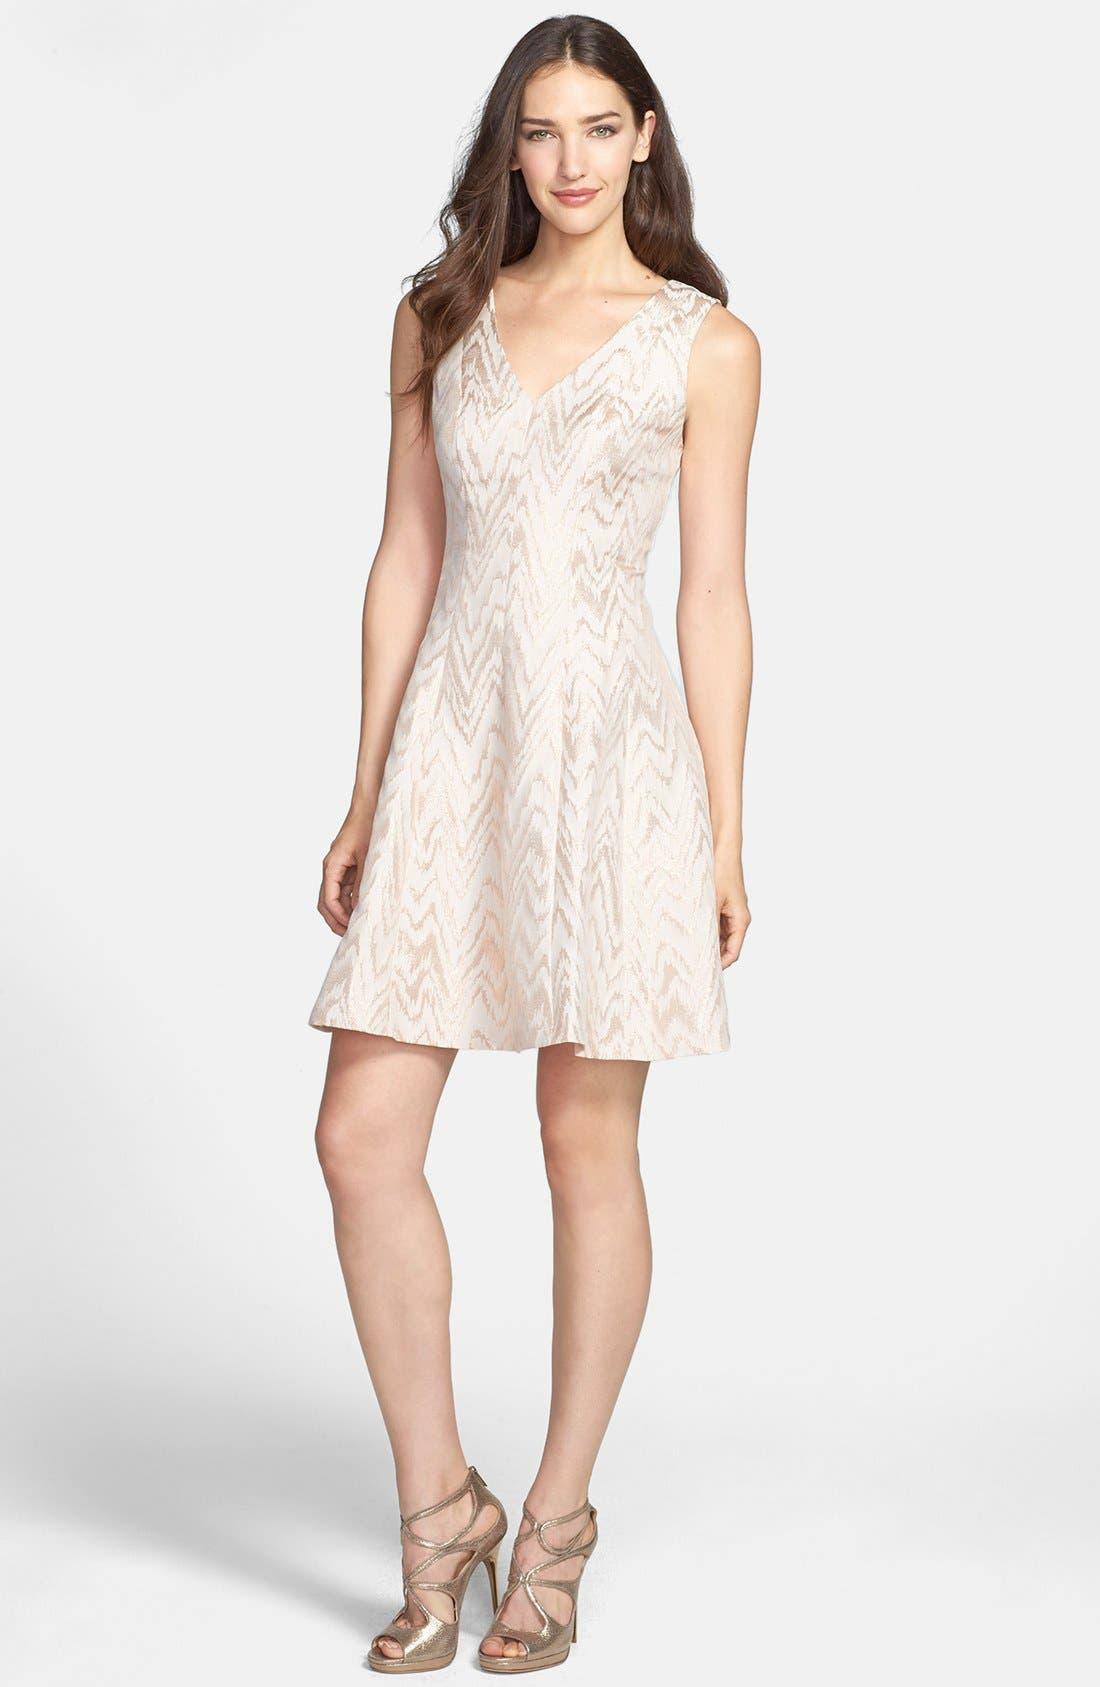 Alternate Image 1 Selected - Vince Camuto Metallic Jacquard Fit & Flare Dress